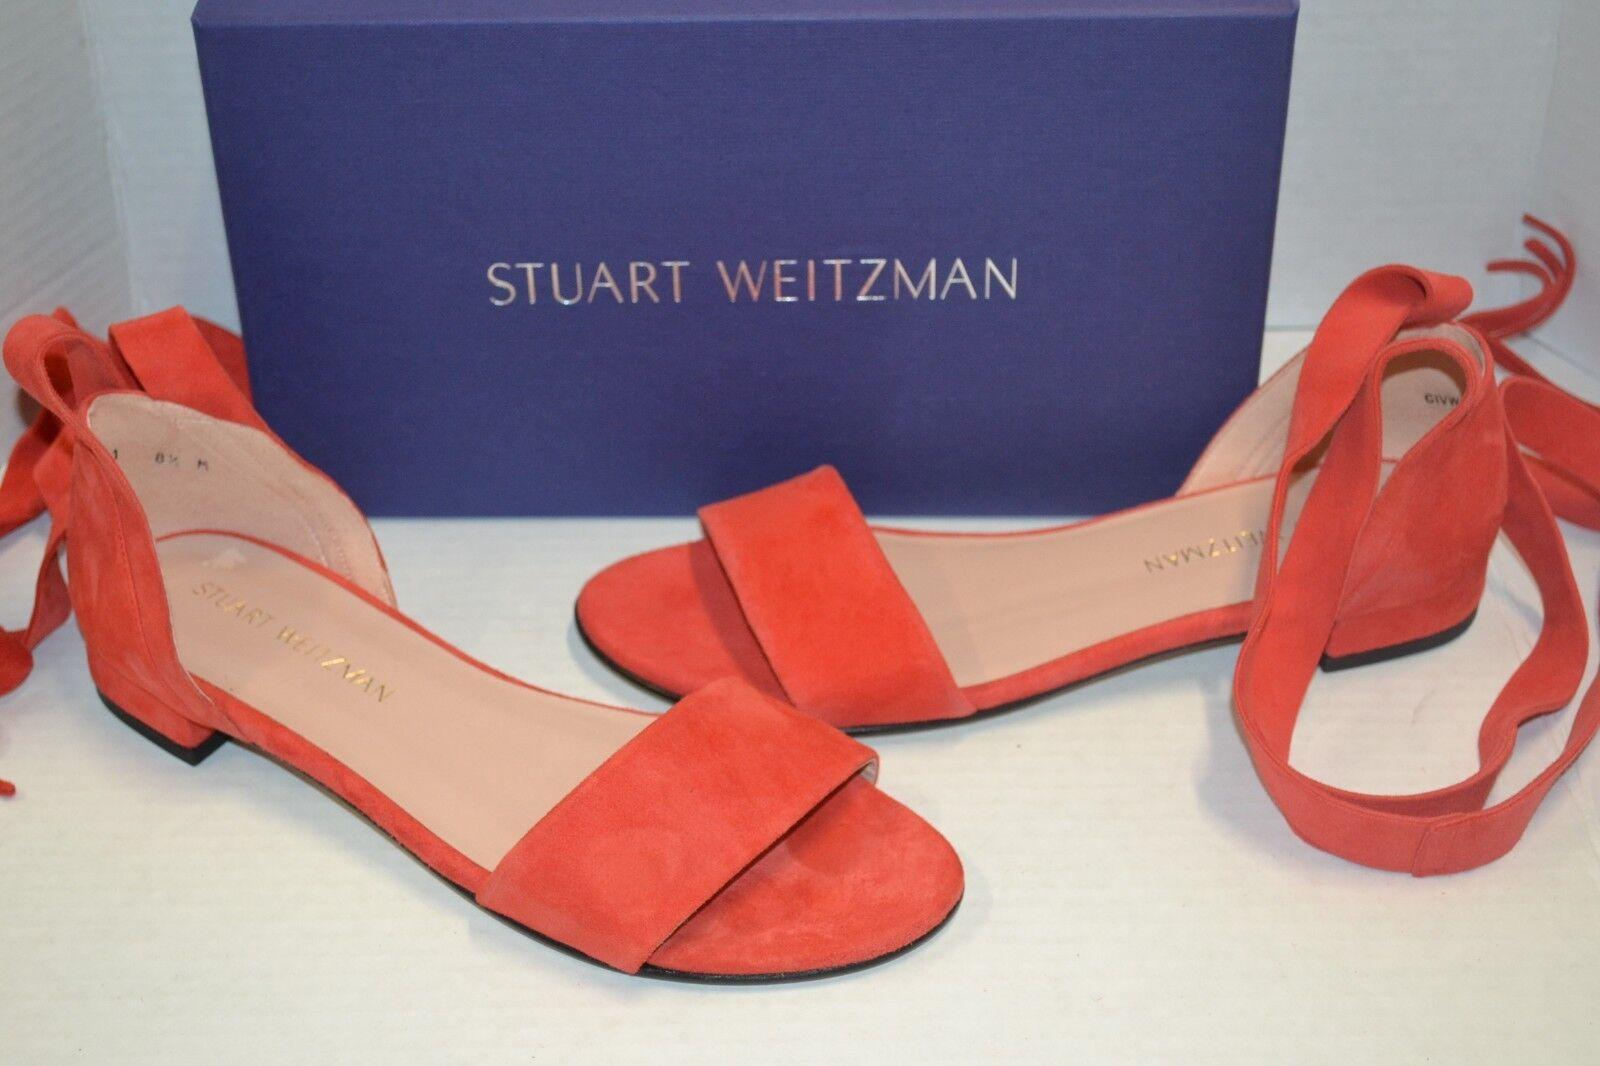 Stuart Weitzman Corbata pimientos rojo gamuza 7 M Con Con Con Cordones Sandalias Planas  395 España  nuevo estilo